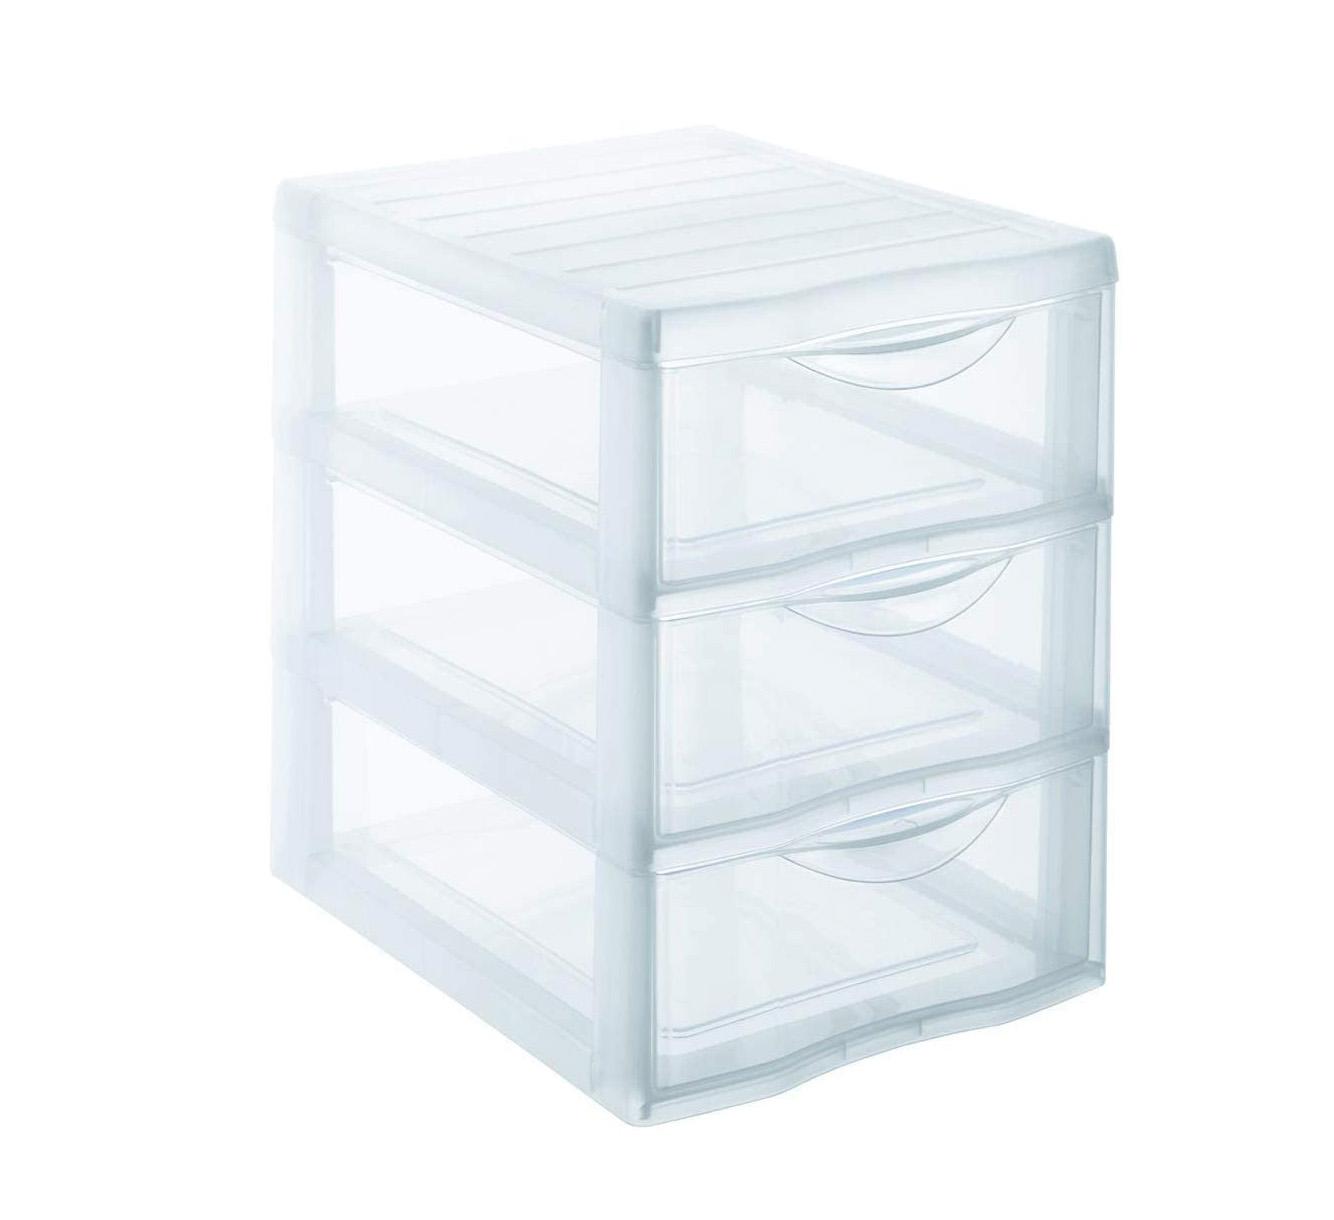 Almacenamiento transparente caja tienda online de artículos transparentes caja transparente organizador